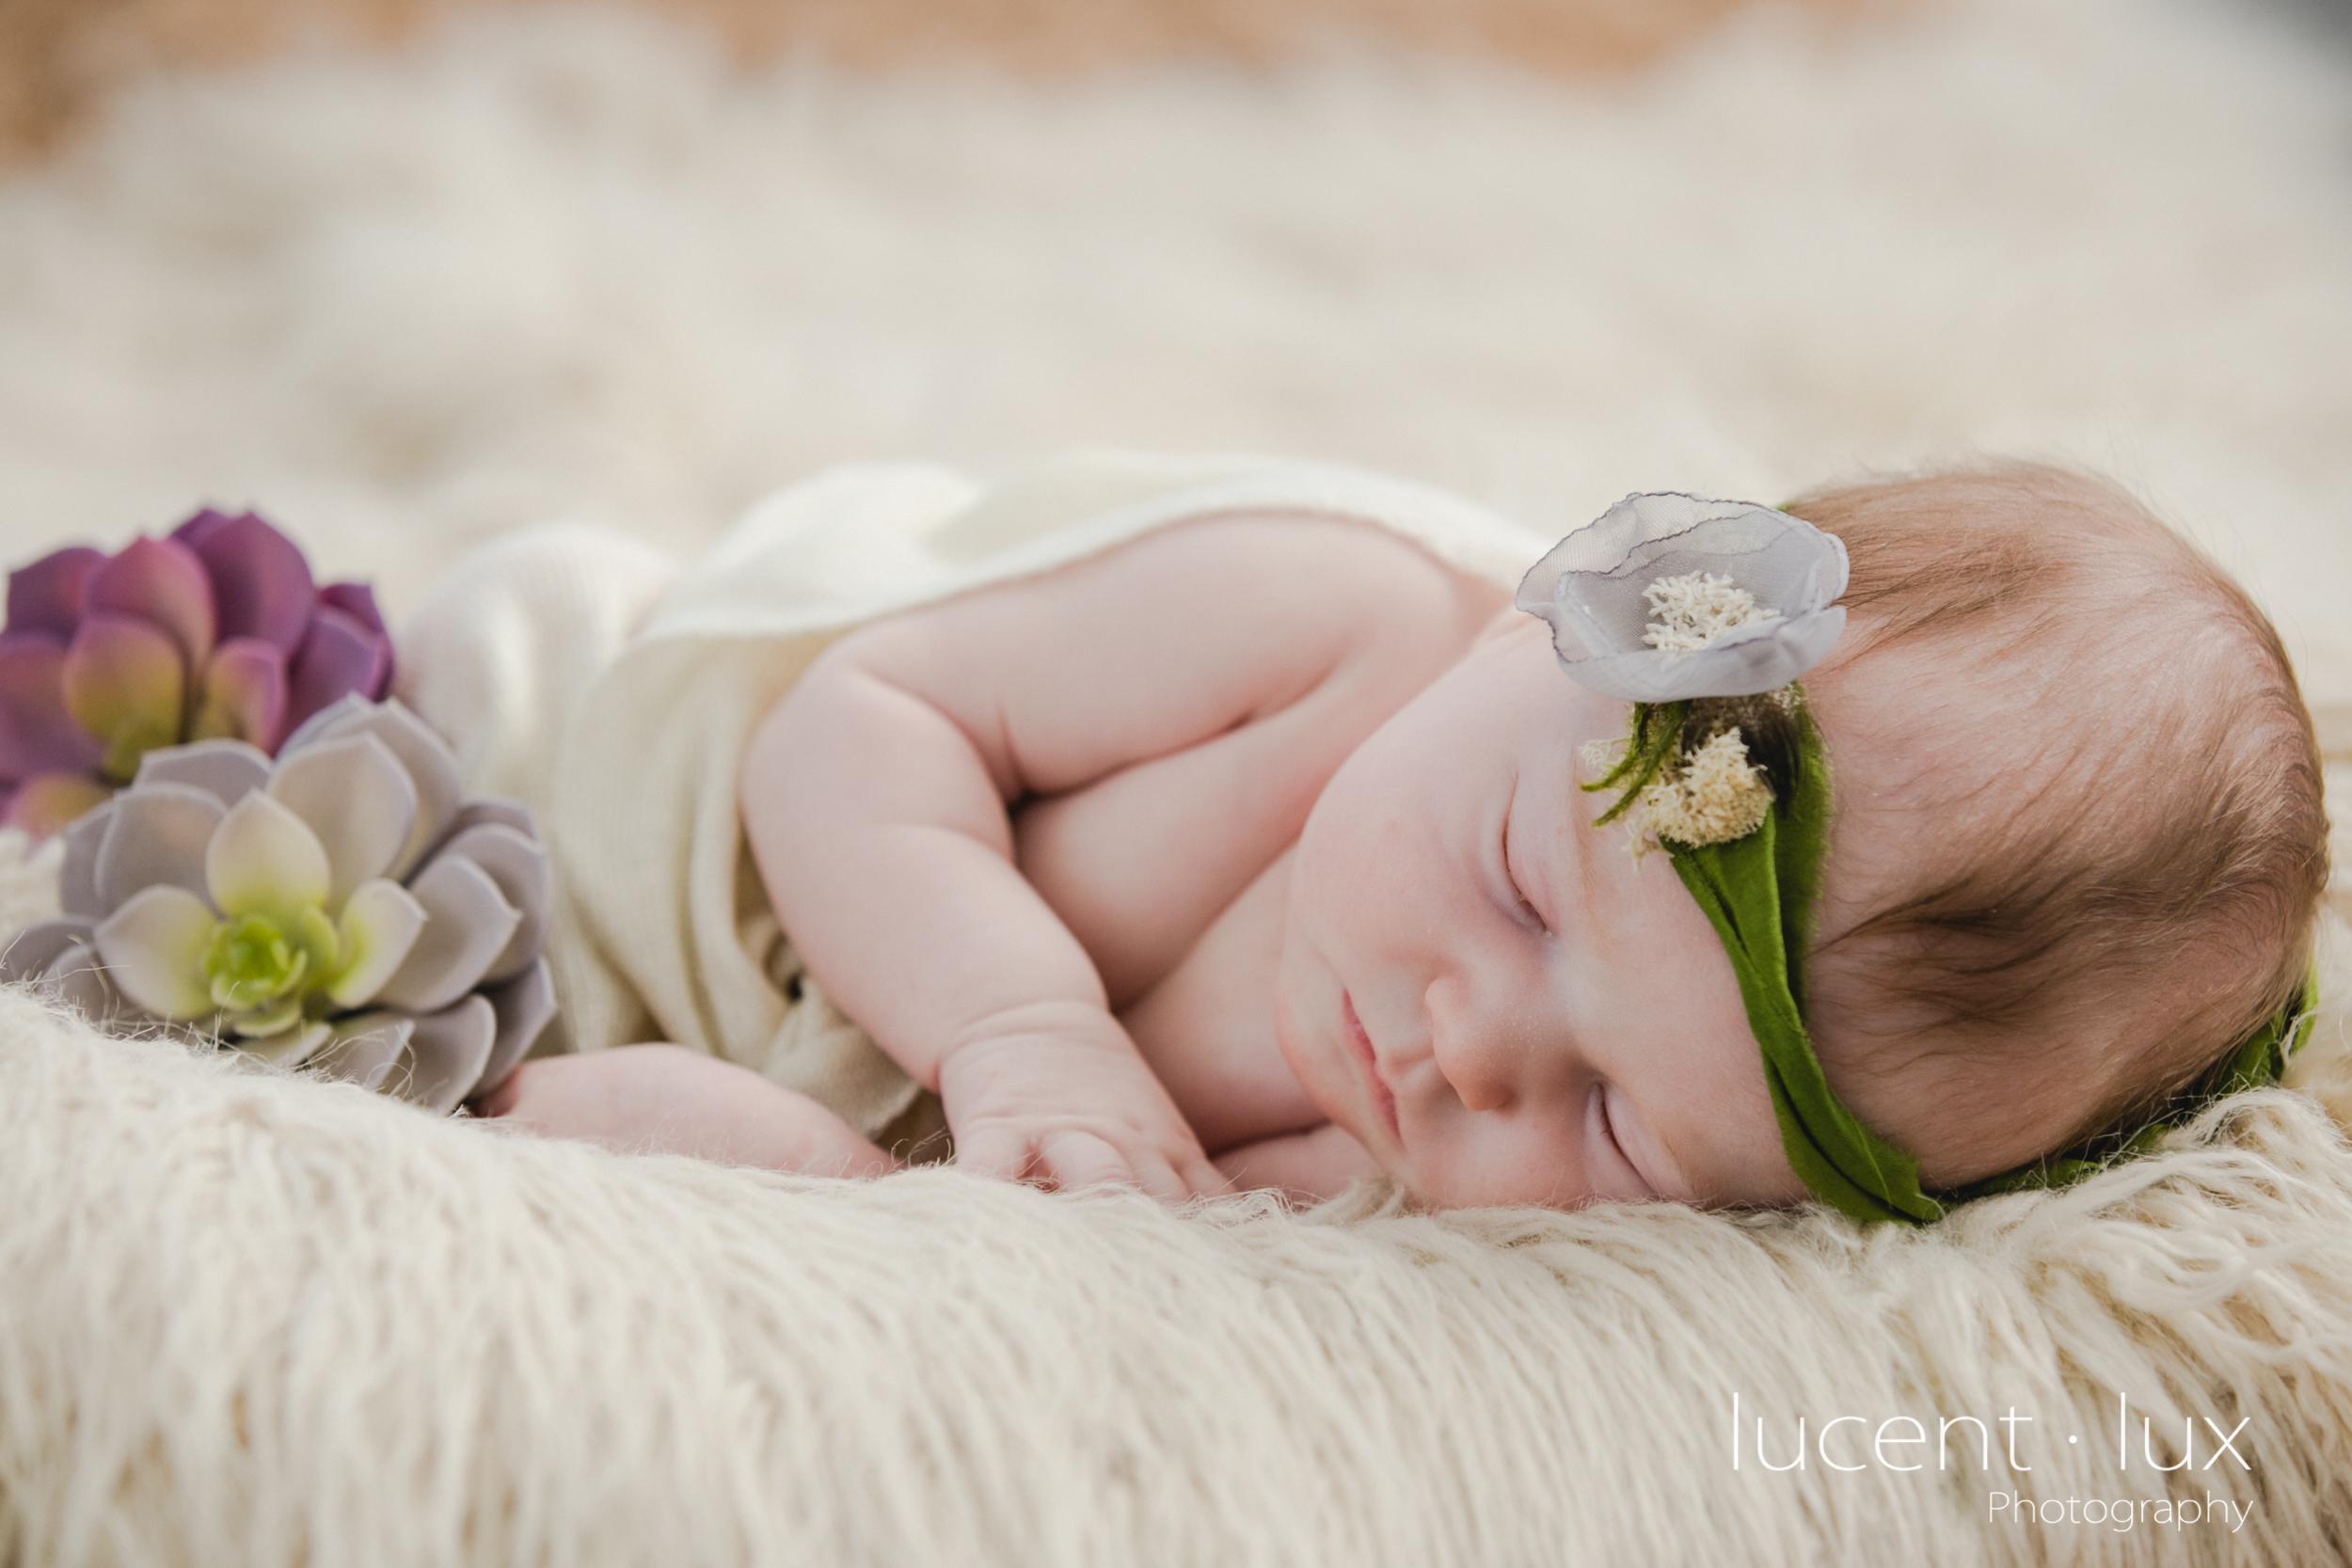 Baltimore-Newborn-Maryland-Maternity-Newborn-Photography-Washington-DC-Photographer-Portrait-Children-Baby-Photography-Family-Portraits-140.jpg